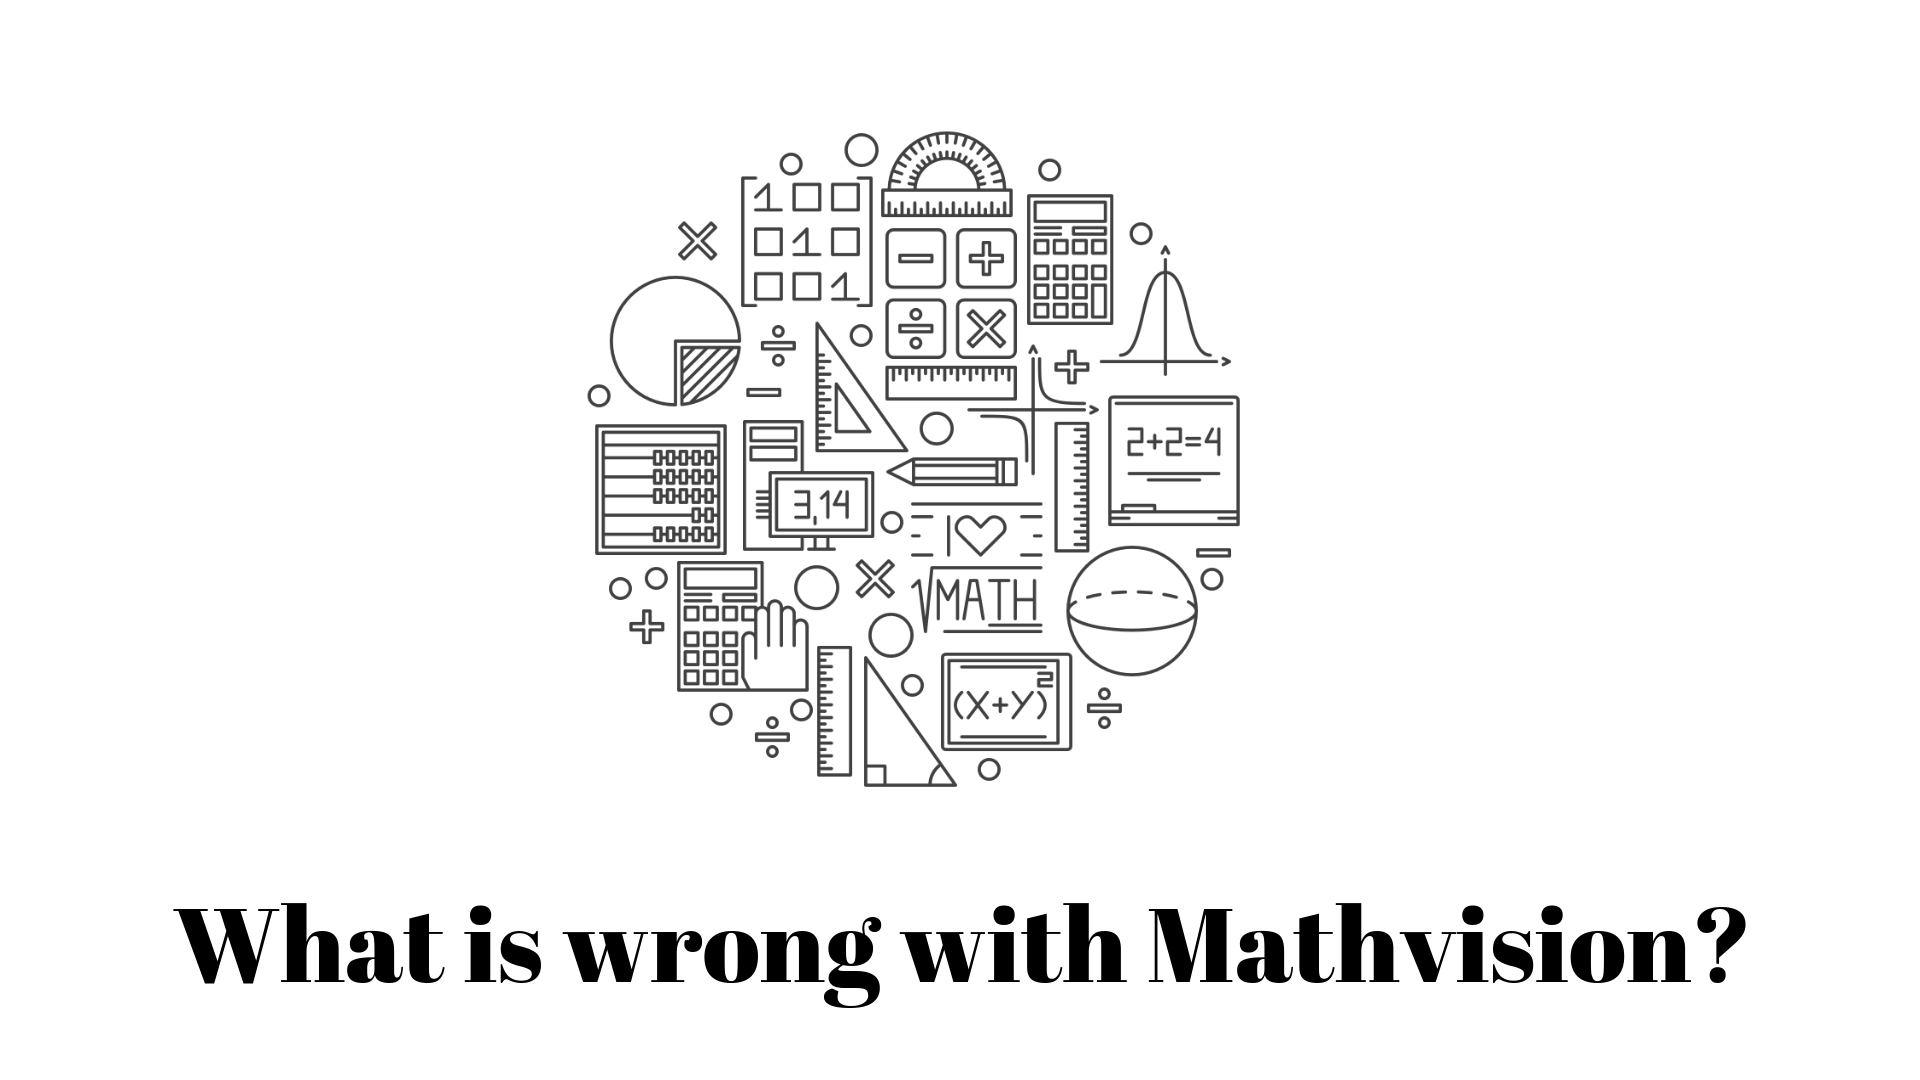 mathvision.png